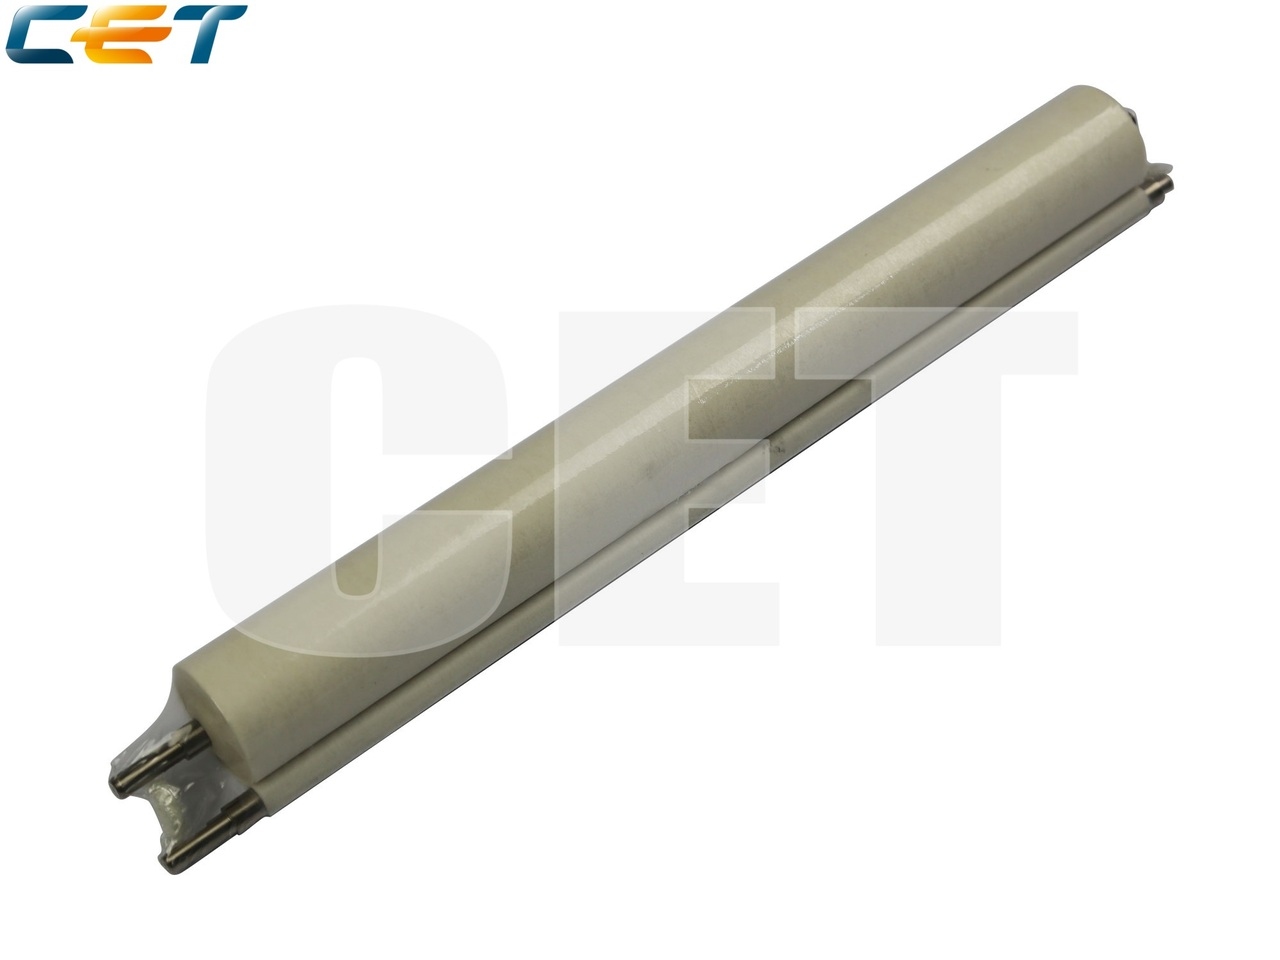 Чистящая лента фьюзера 8R13042, 8R13085, 8R13000 дляXEROX WorkCentre 4110/4112/4127/4590/4595 (CET), CET7935